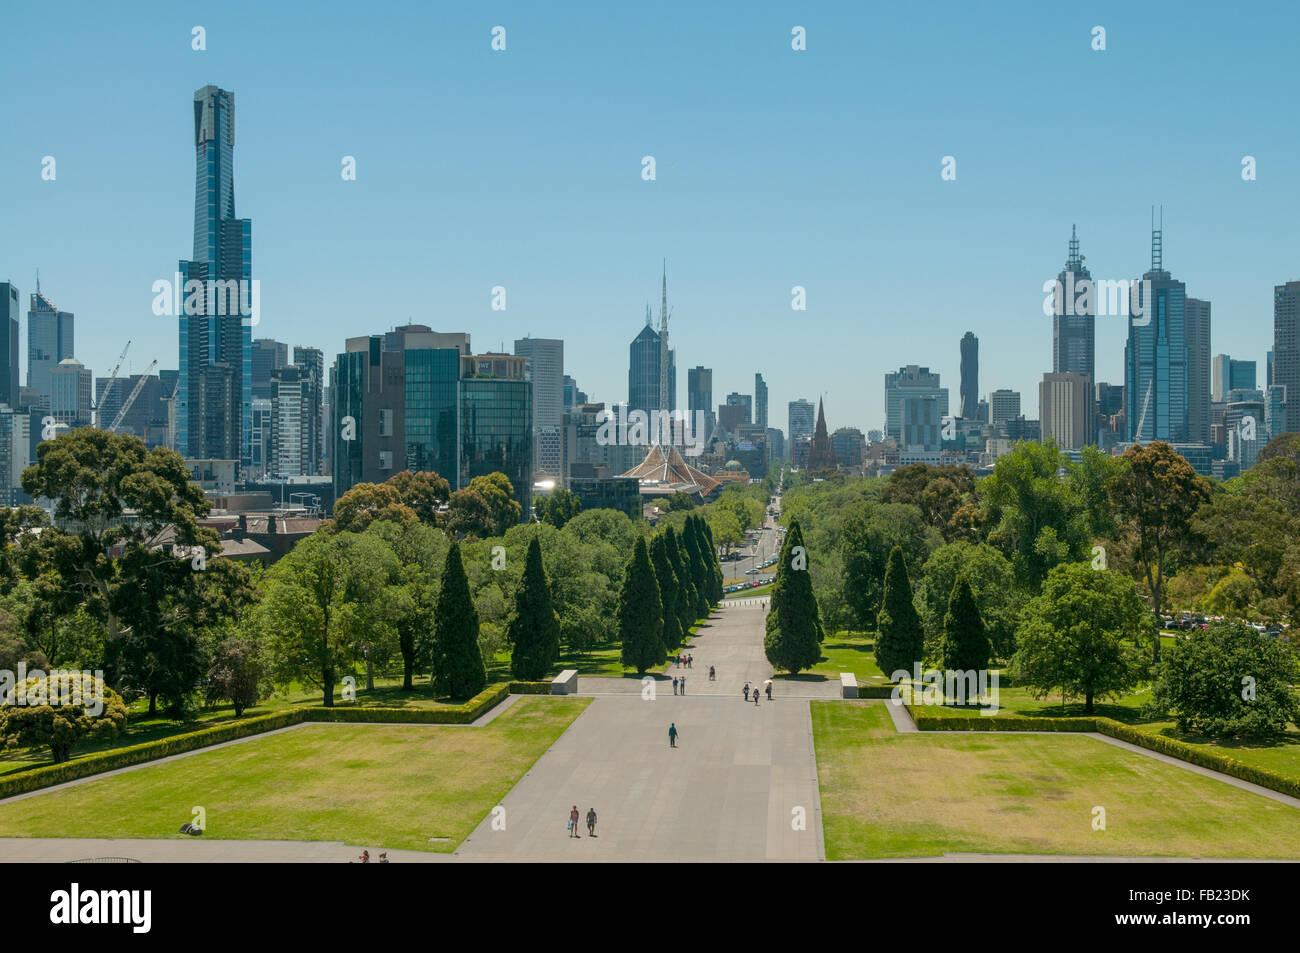 City Skyline from Shrine of Remembrance, Melbourne, Victoria, Australia - Stock Image